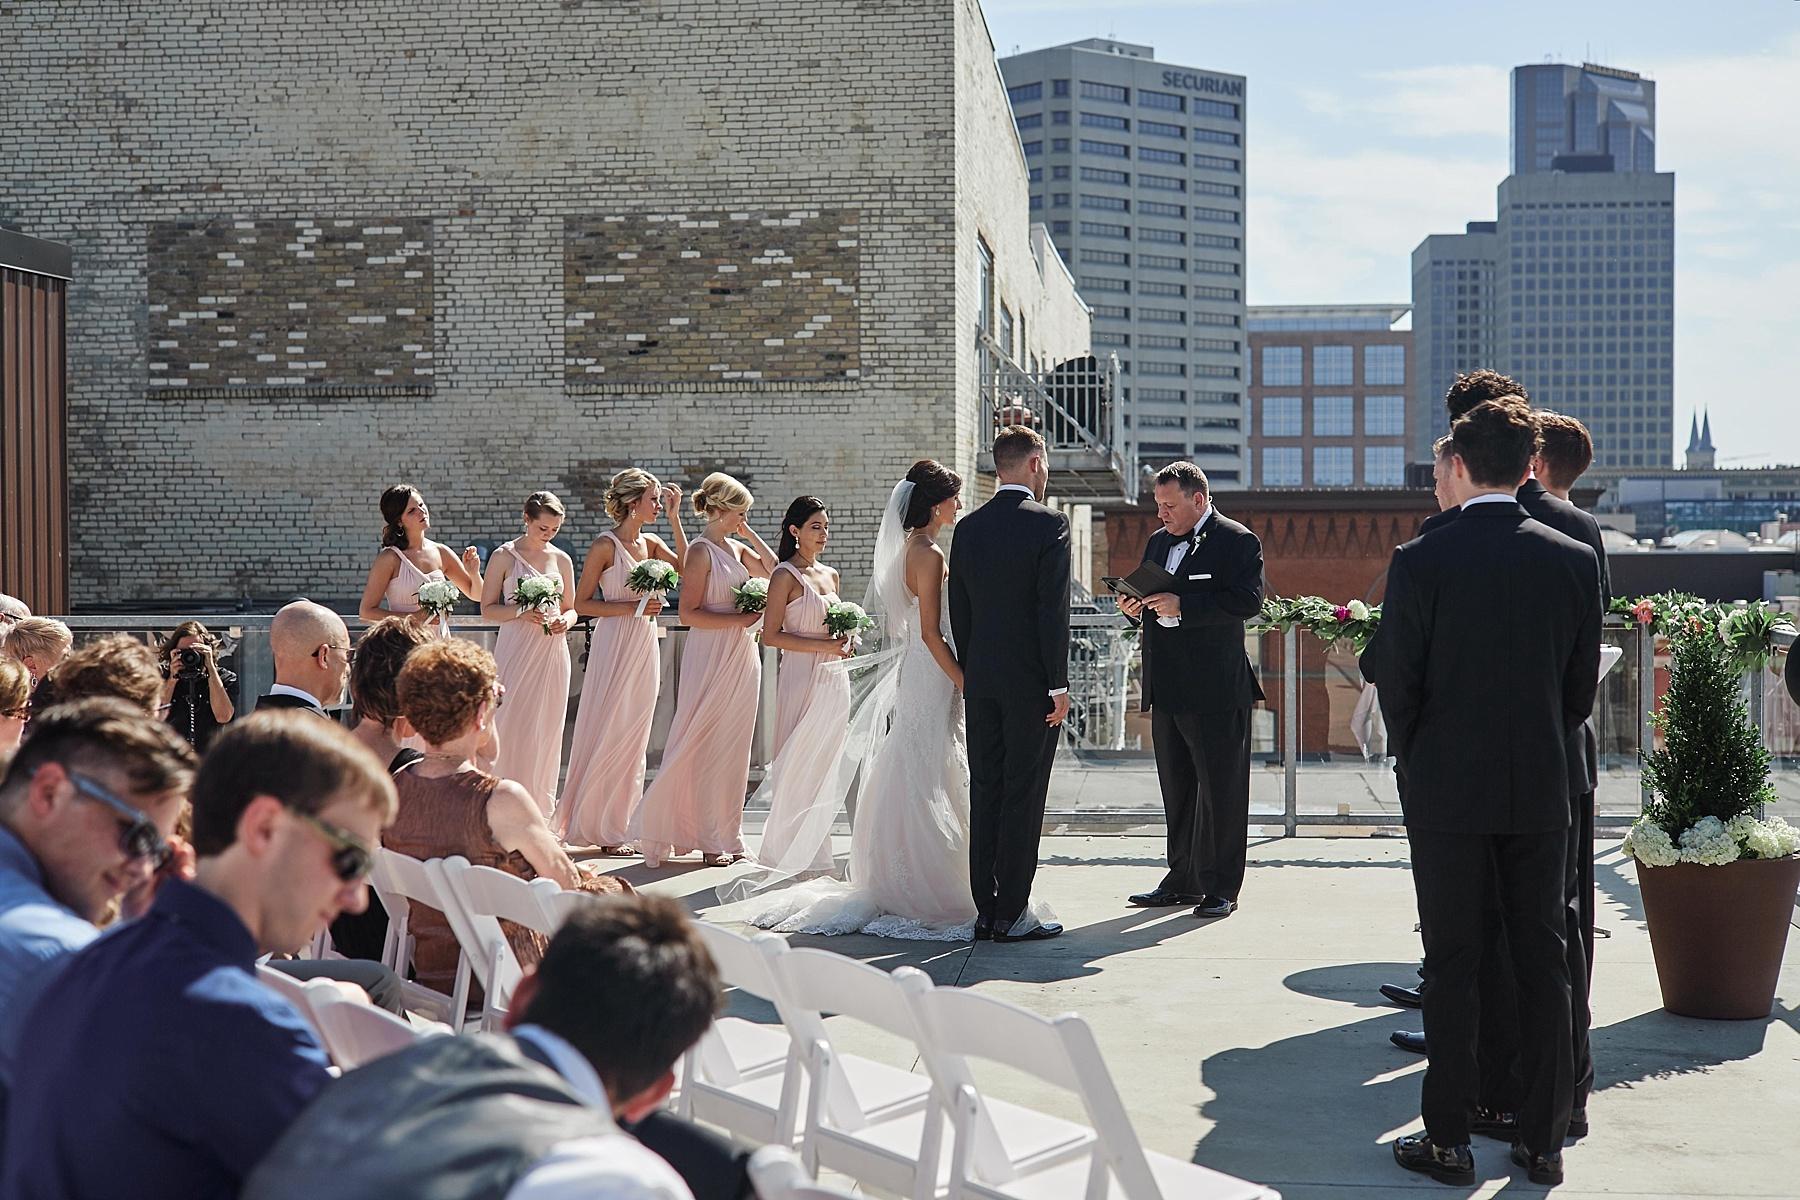 ABULAE-Wedding-Saint-paul-MN-Josh-Sofia-Wedding-Mears-Park_0765.jpg